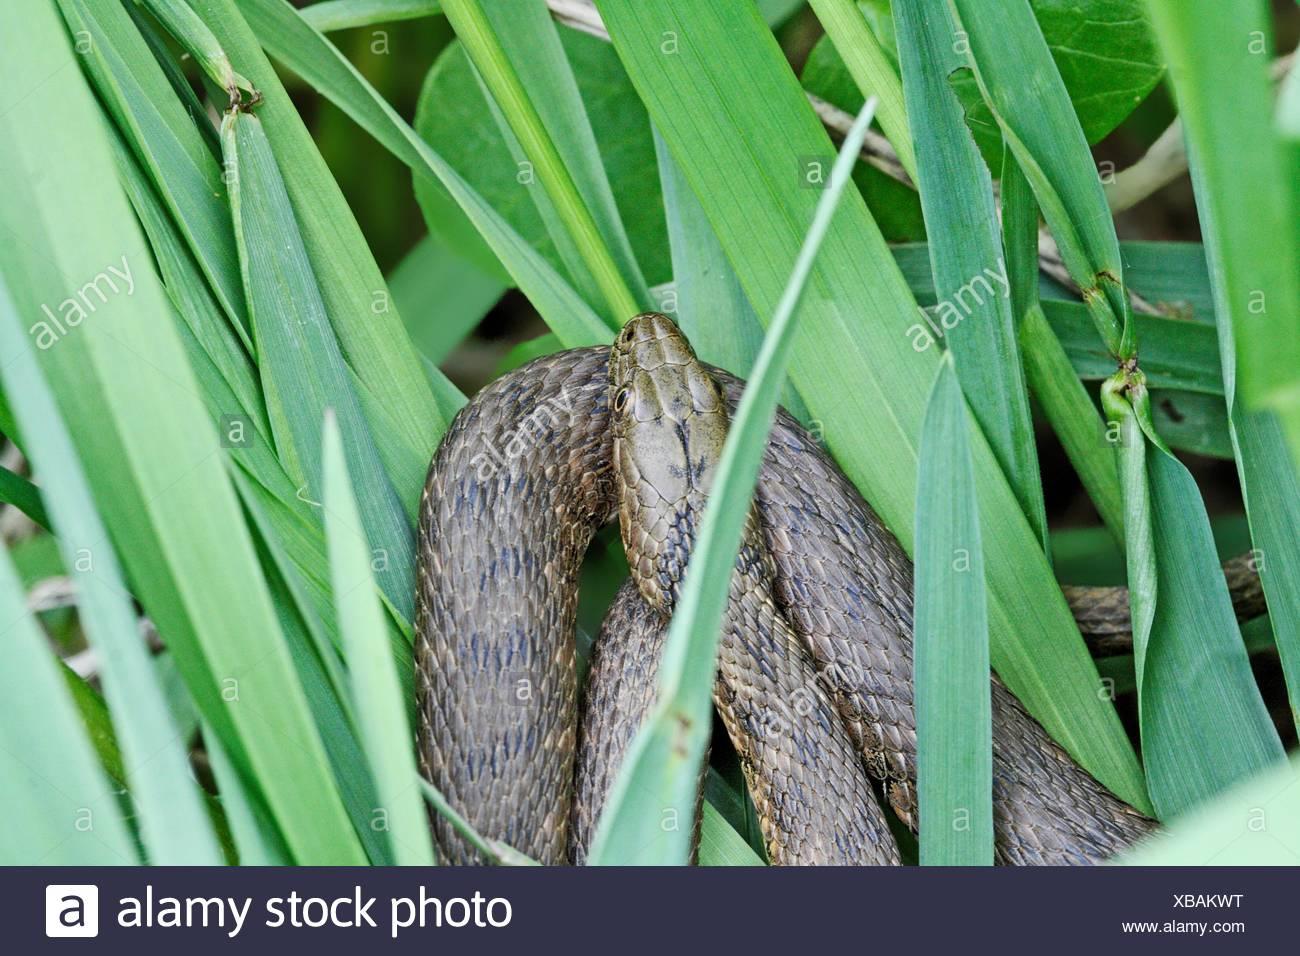 Tessellaed Snake, Natrix tessellata  Female  Gold or copper colored  European non-venomous snake  Colubrid  Dice Snake  The - Stock Image